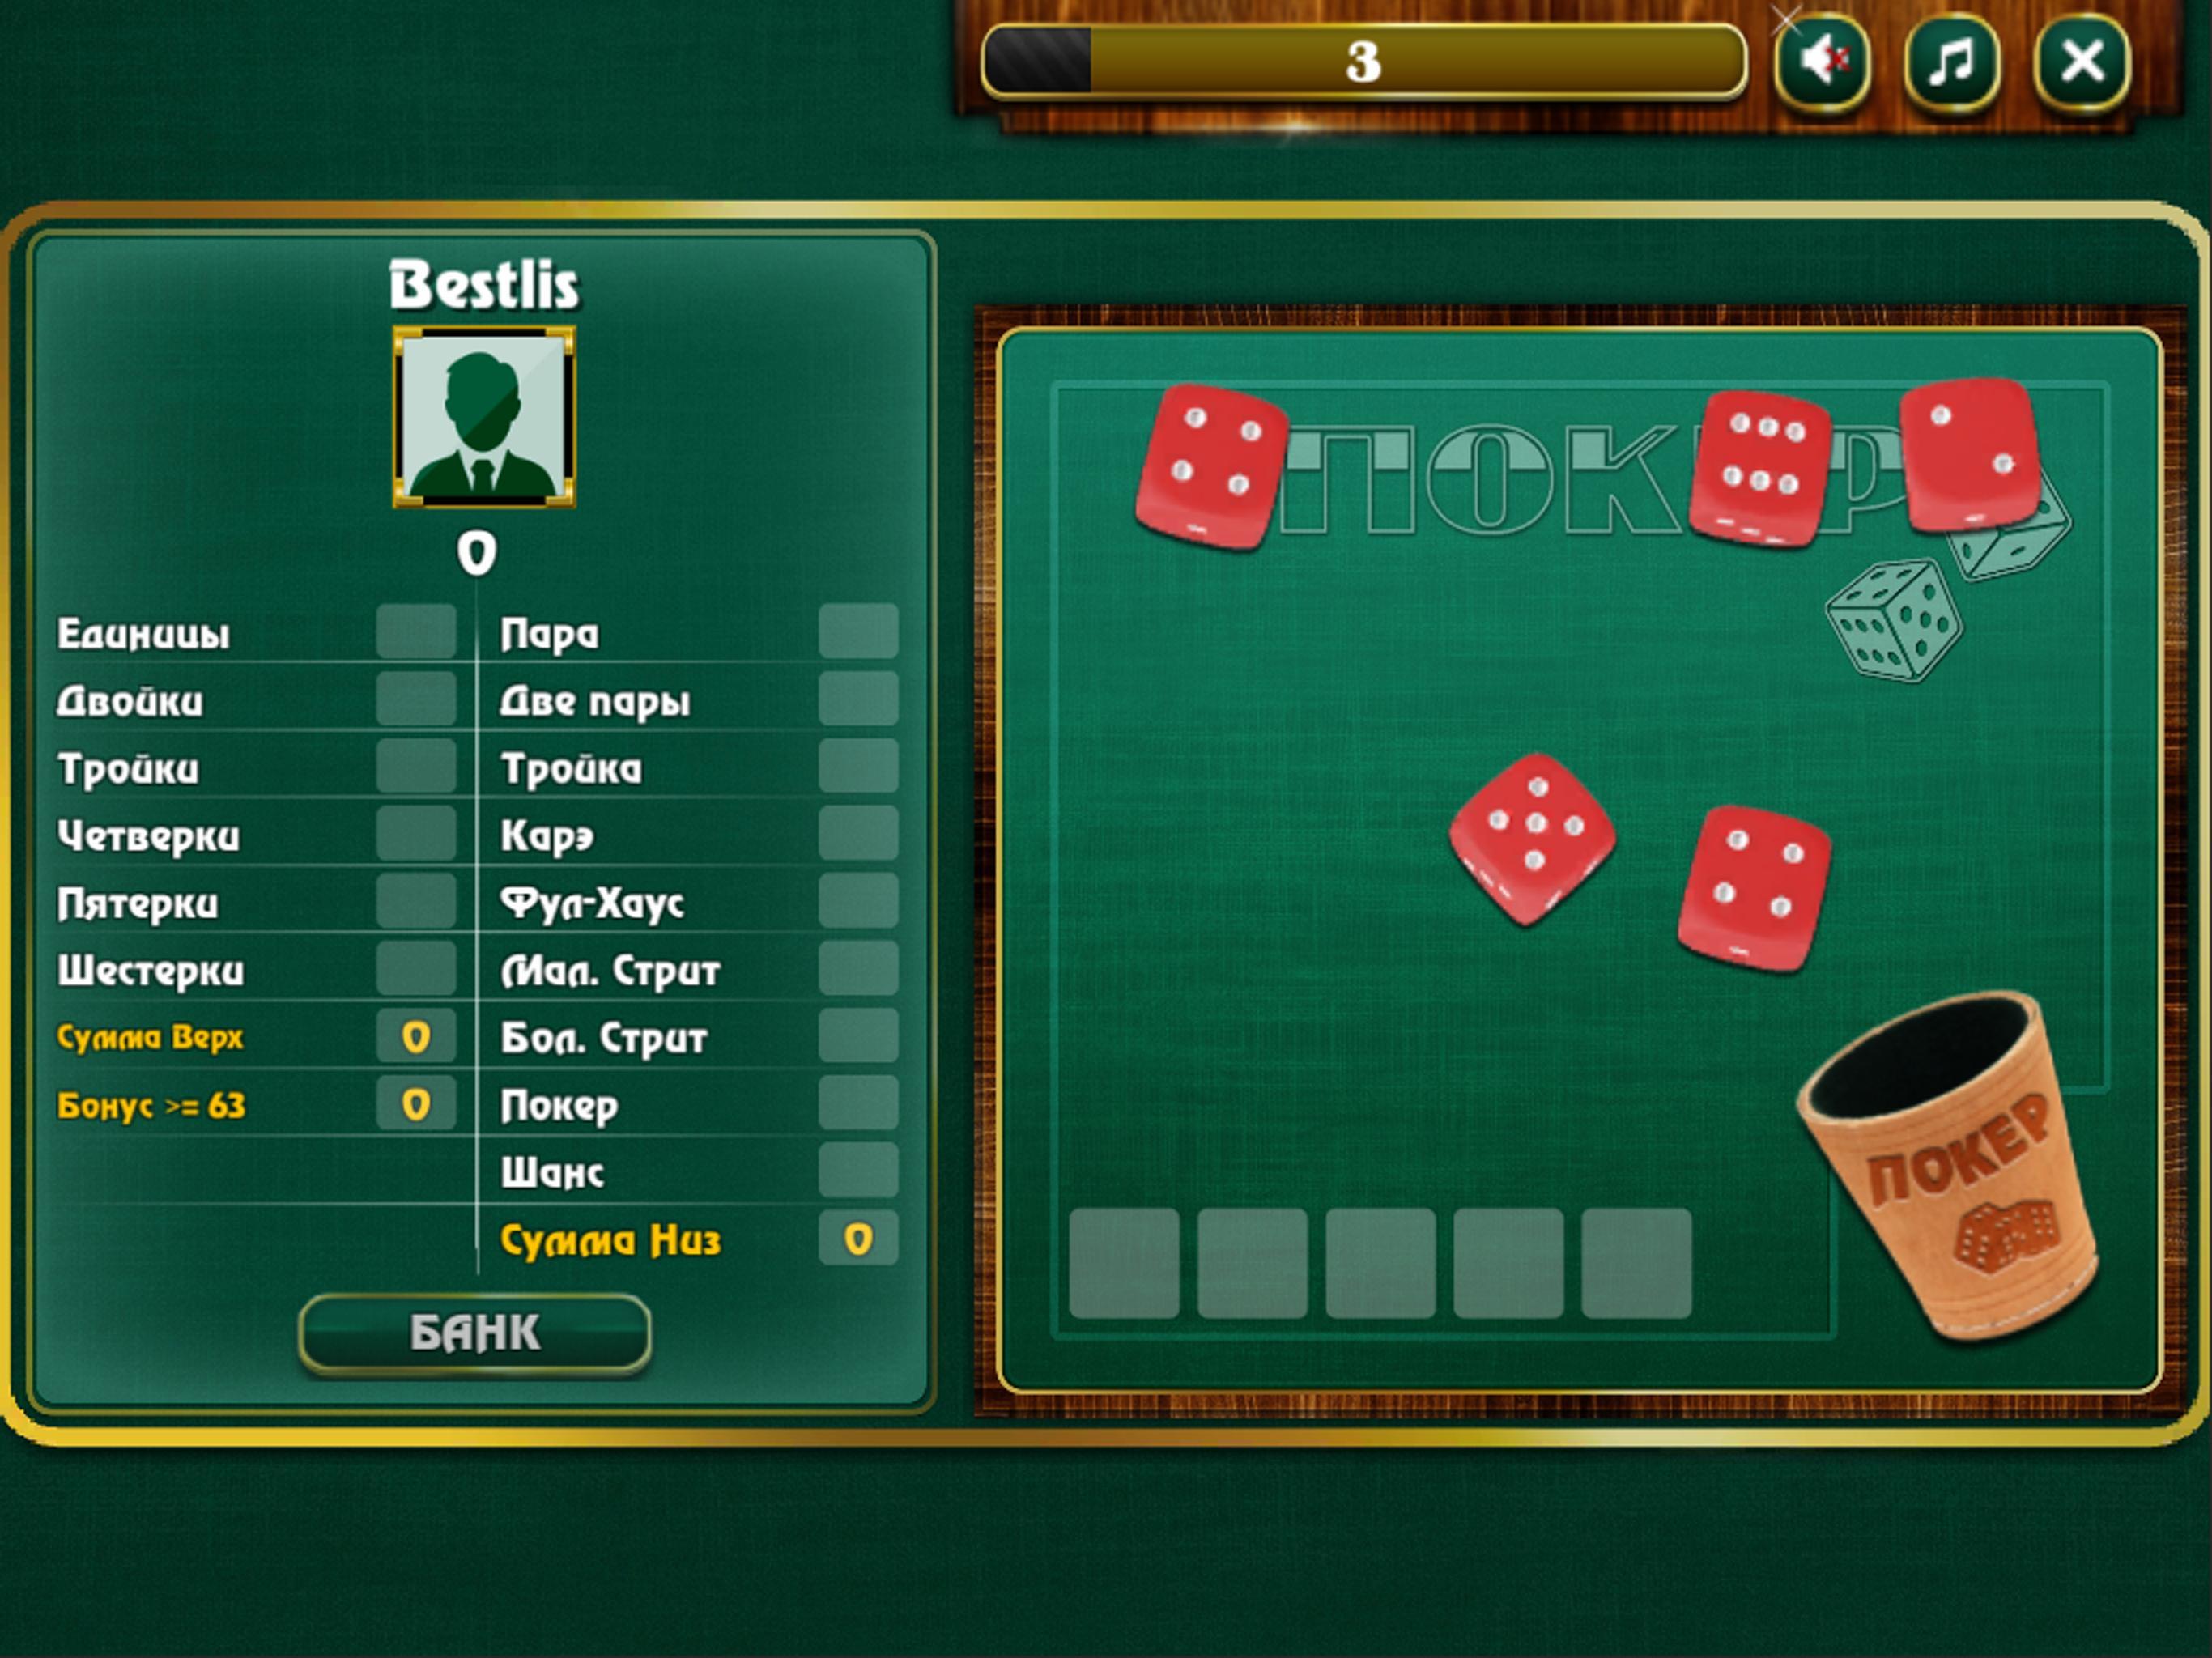 Игра покер в кости онлайн бесплатно чат рулетка онлайн старый